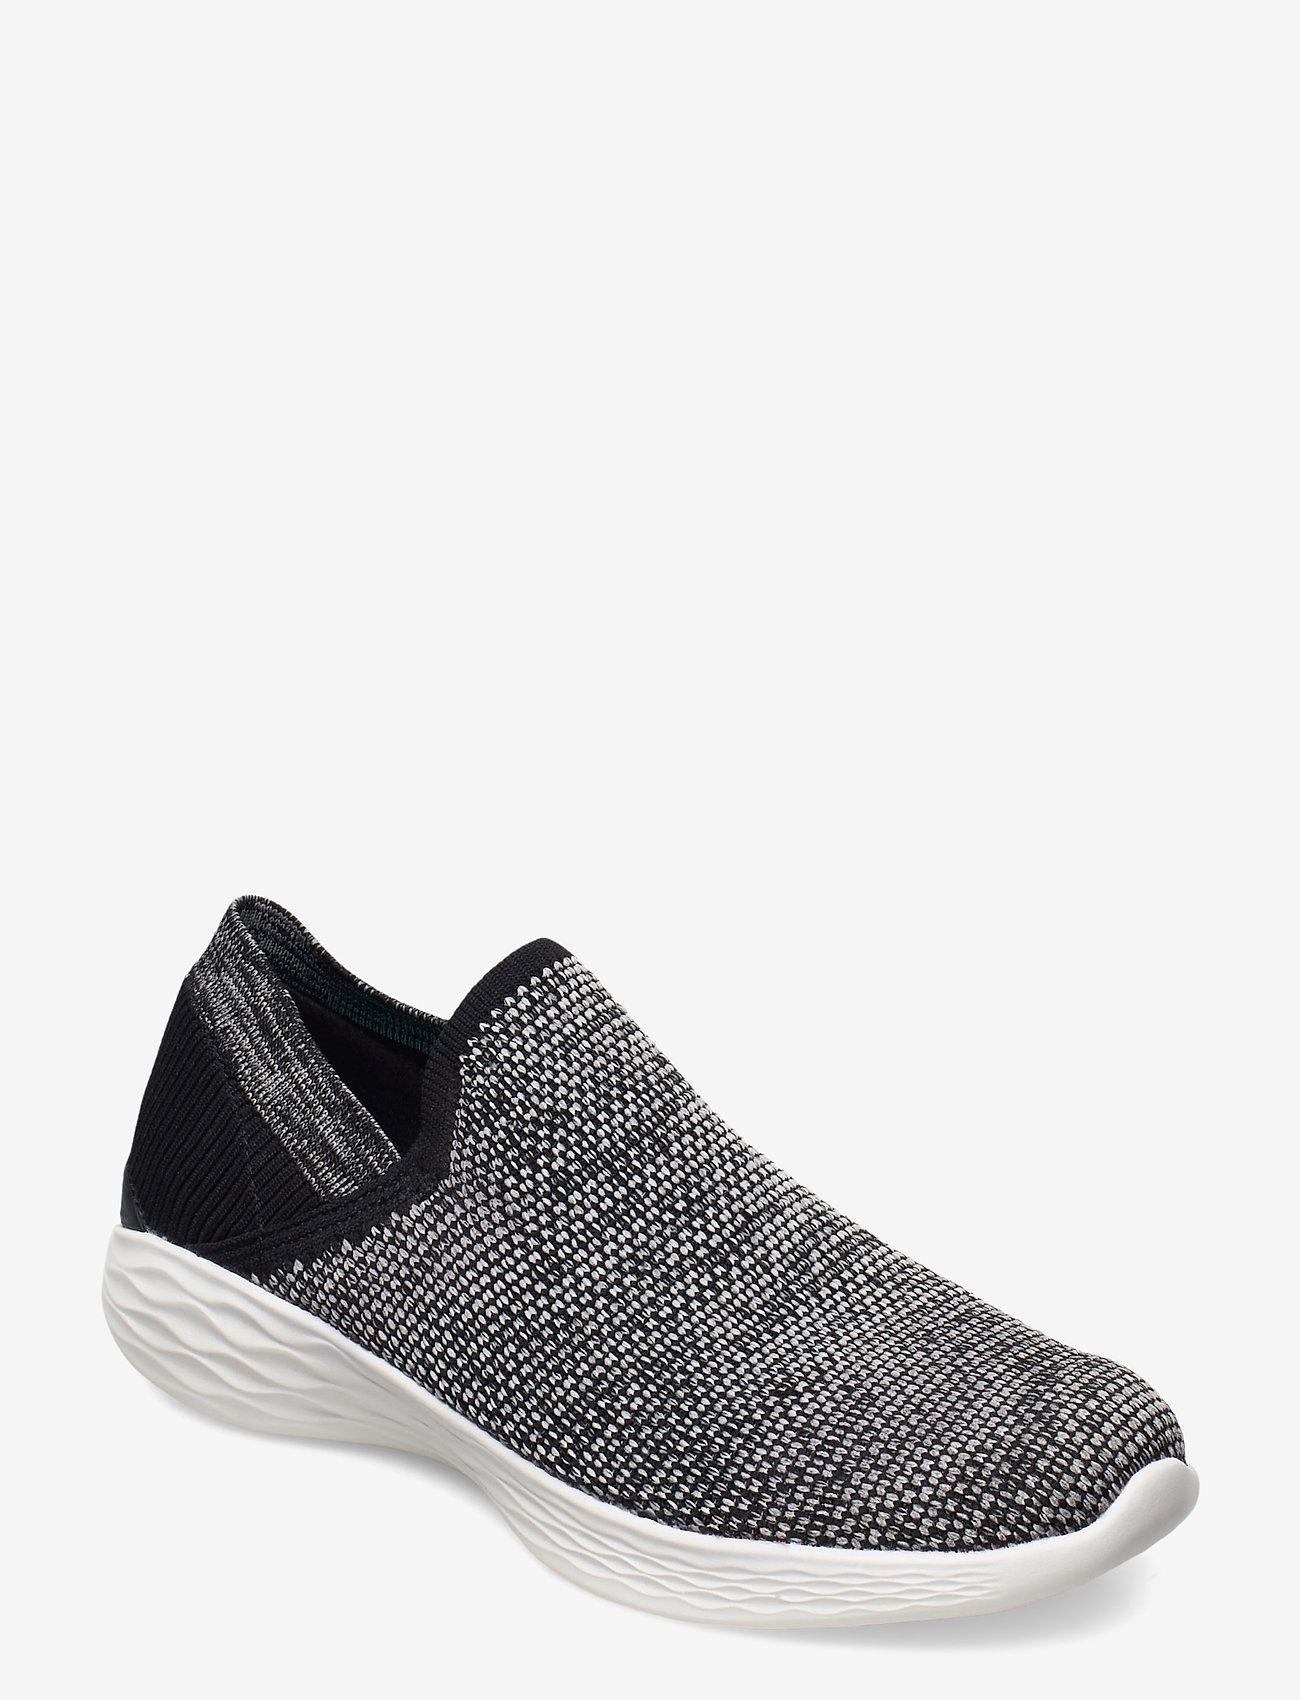 Skechers - Womens YOU - Rise - slip-on sneakers - bkw black white - 0